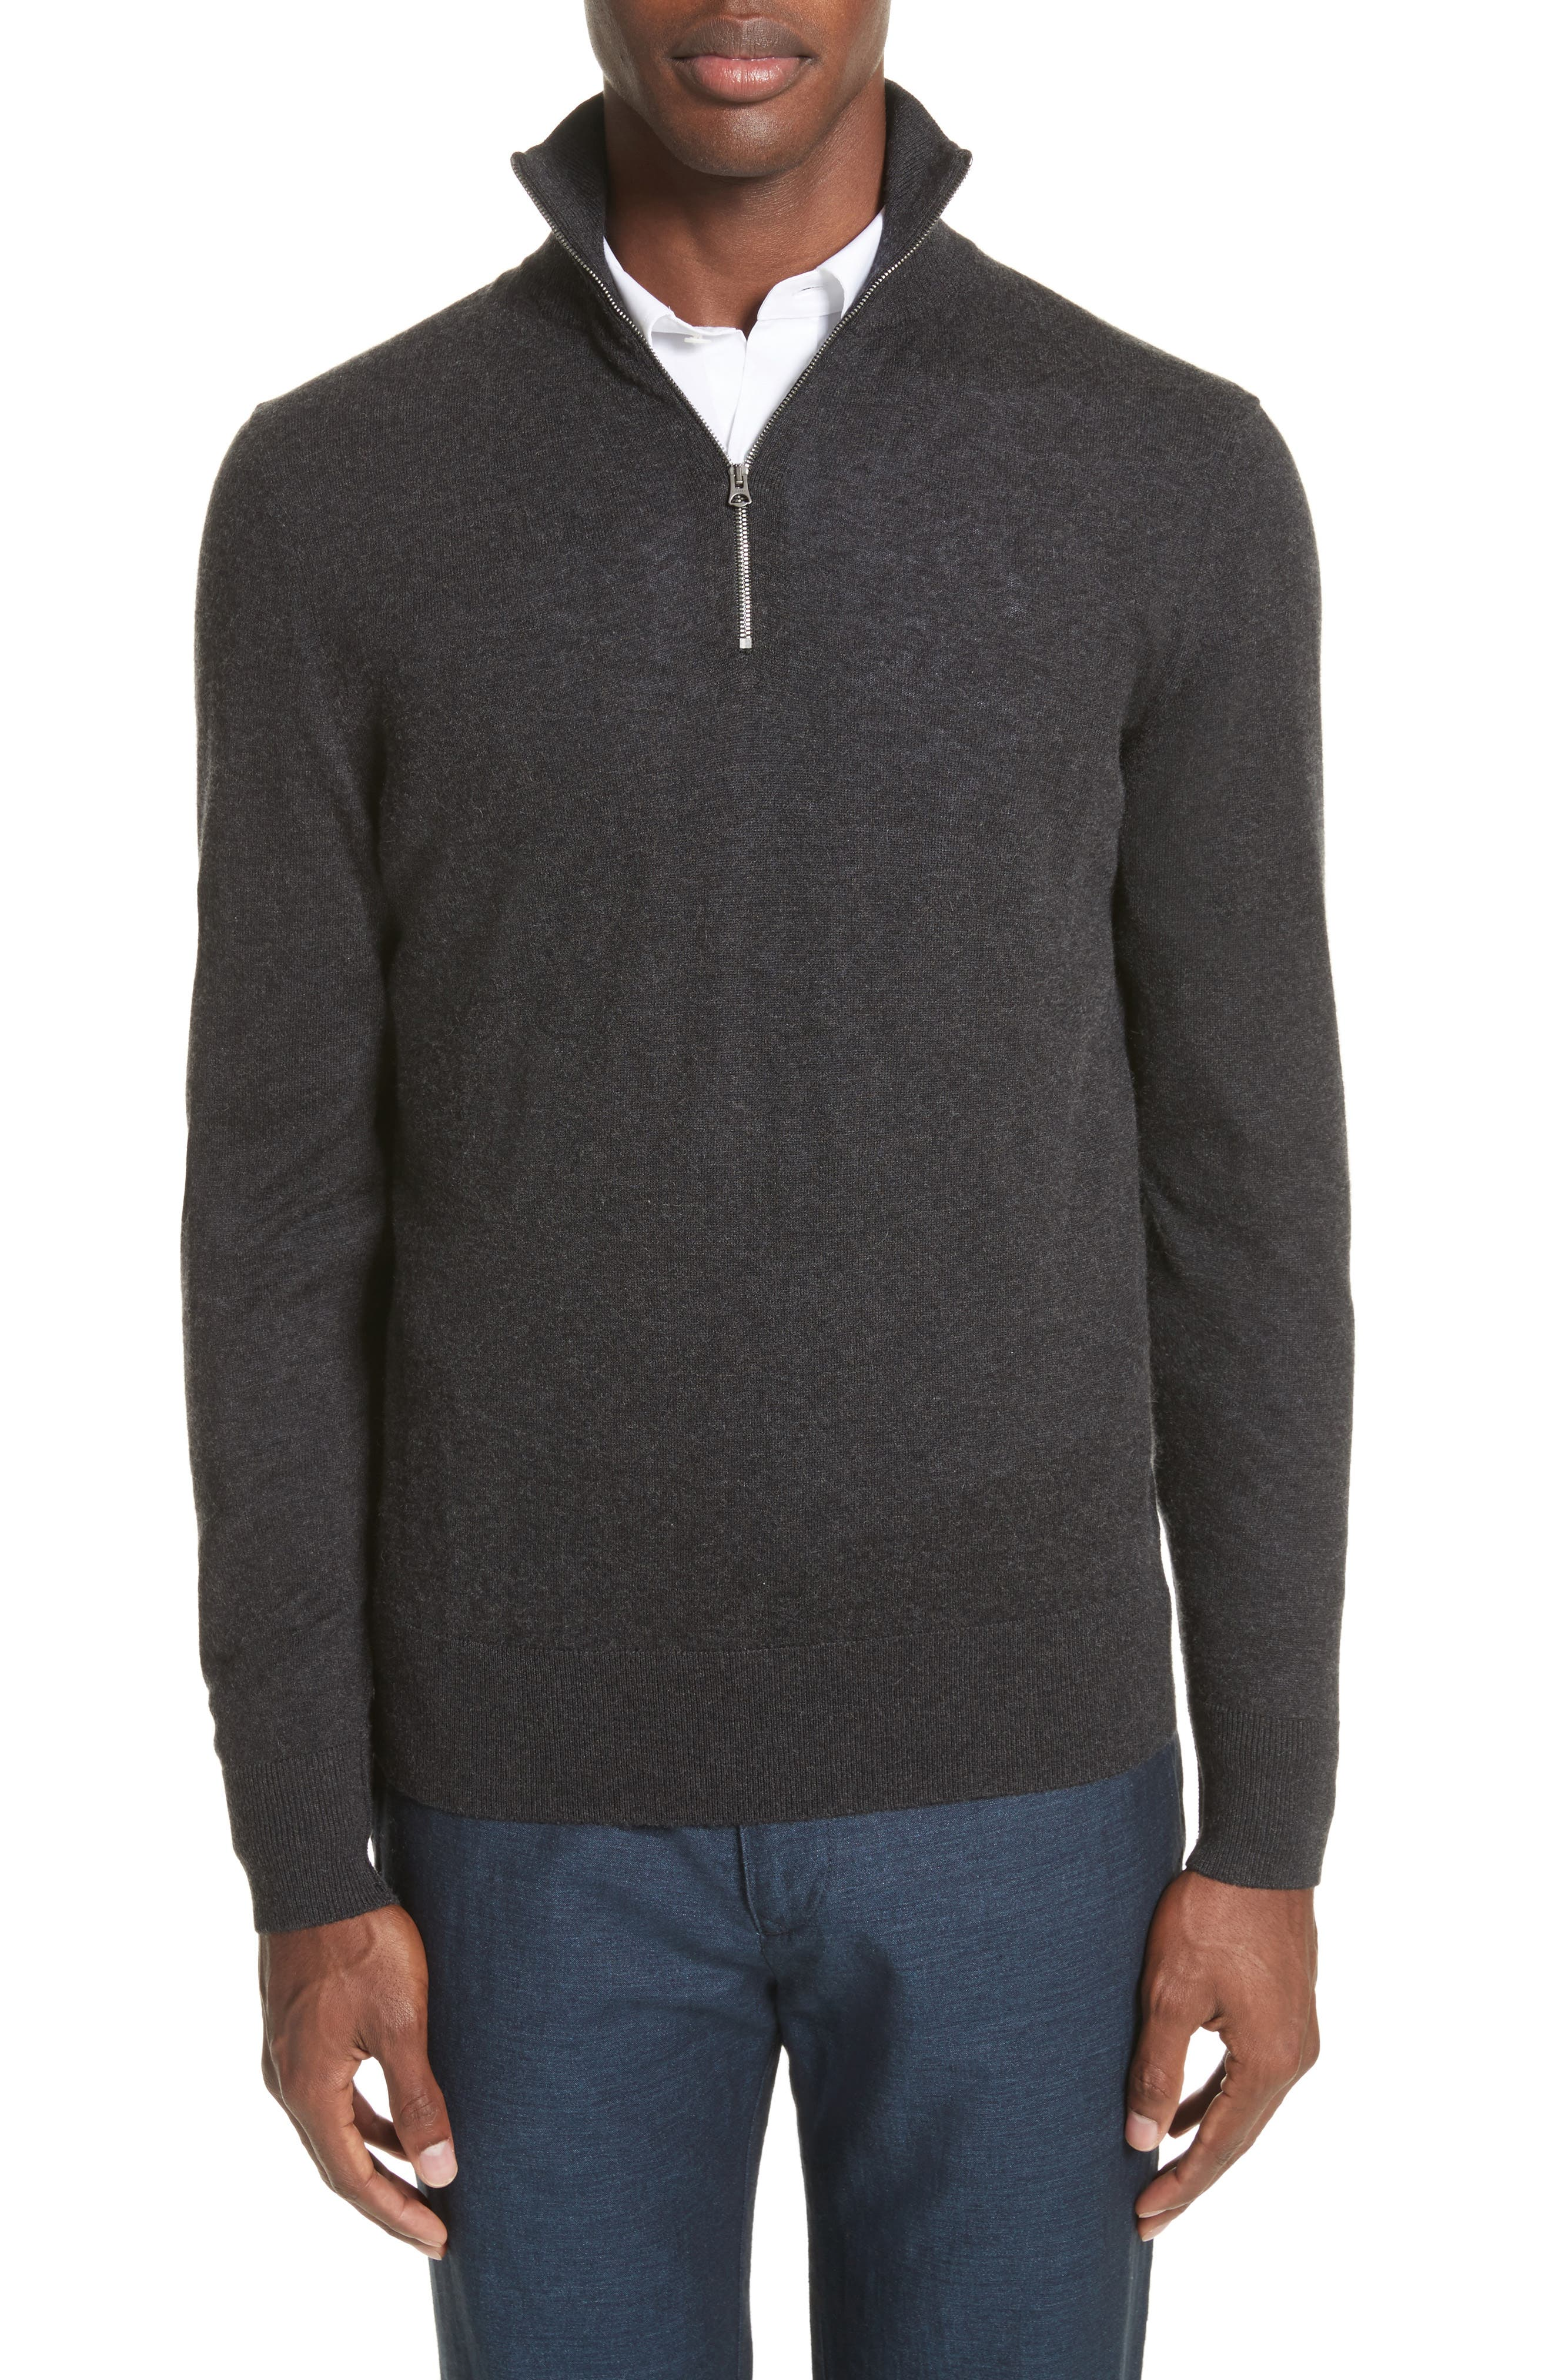 Burberry Rawlins Quarter Zip Cashmere Blend Sweater